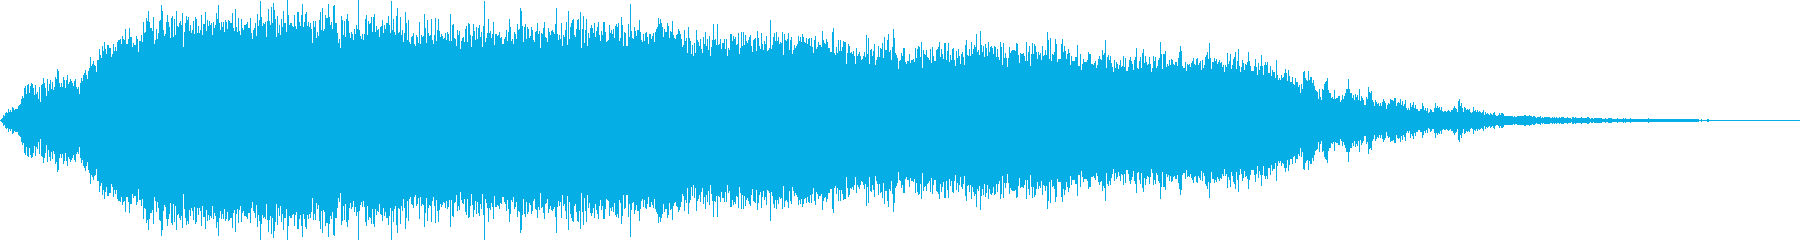 KANT怪獣の鳴き声Long2の再生済みの波形